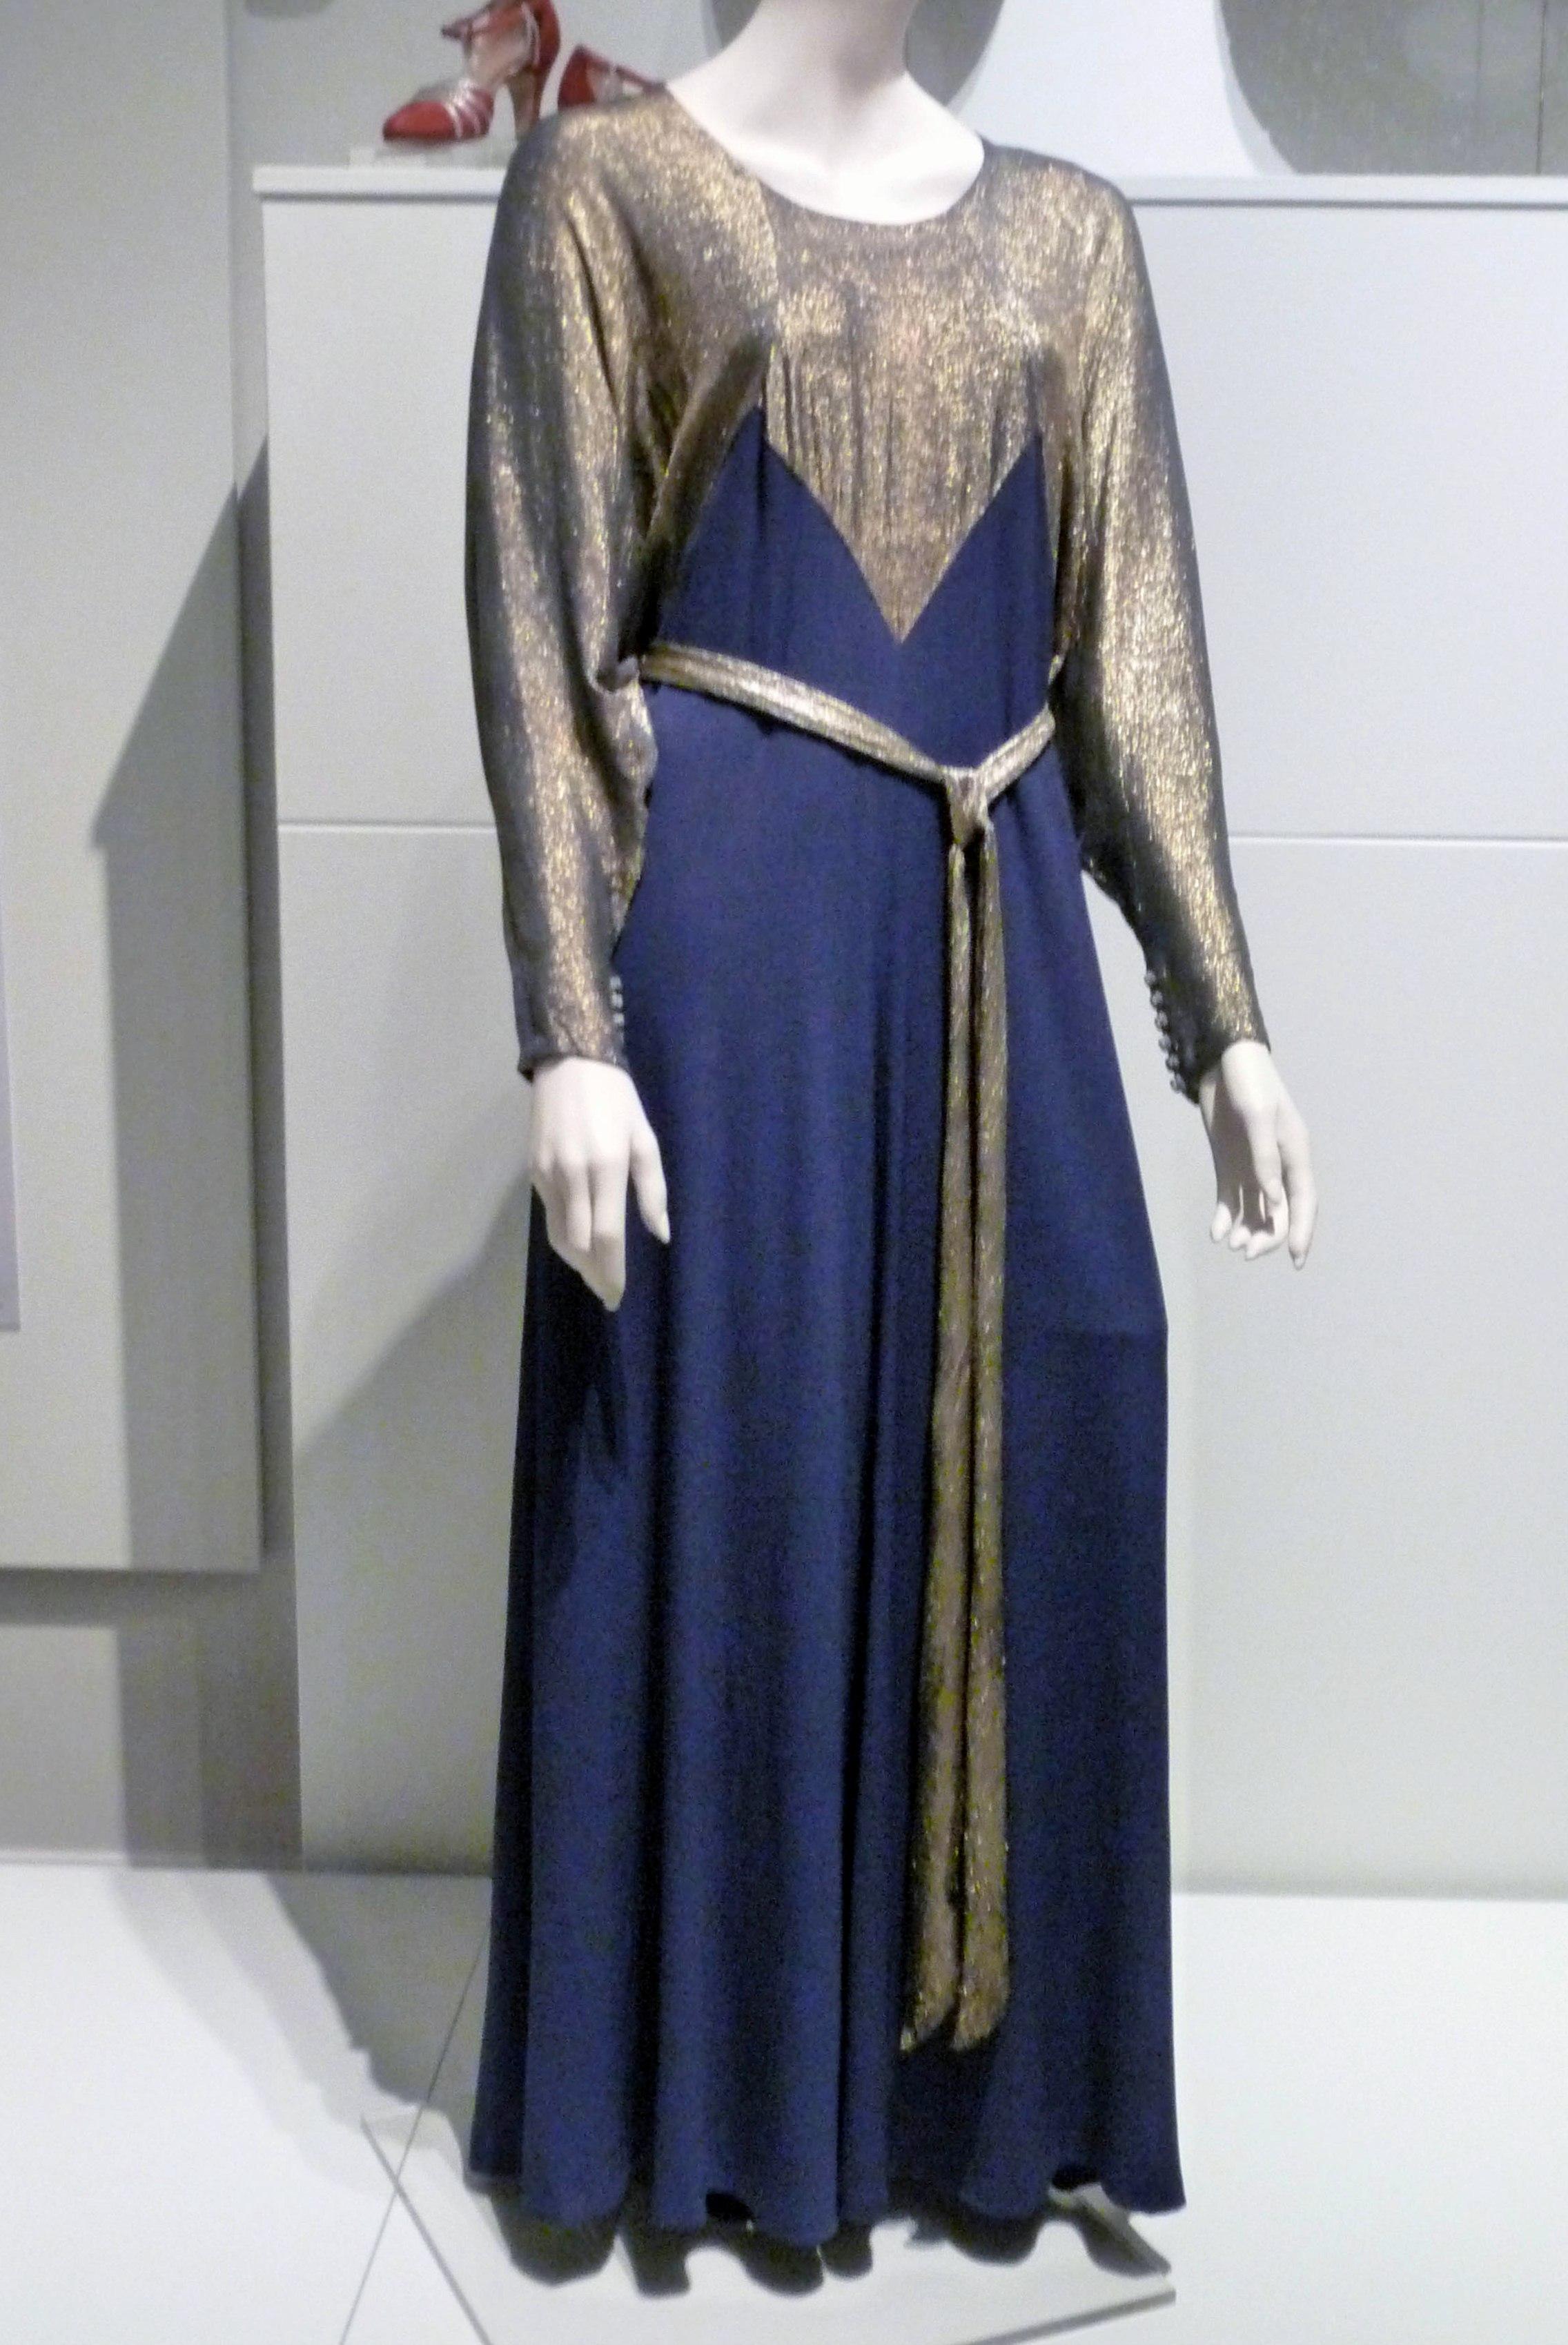 Evening dress, rayon crepe & gold lame, 1935-37